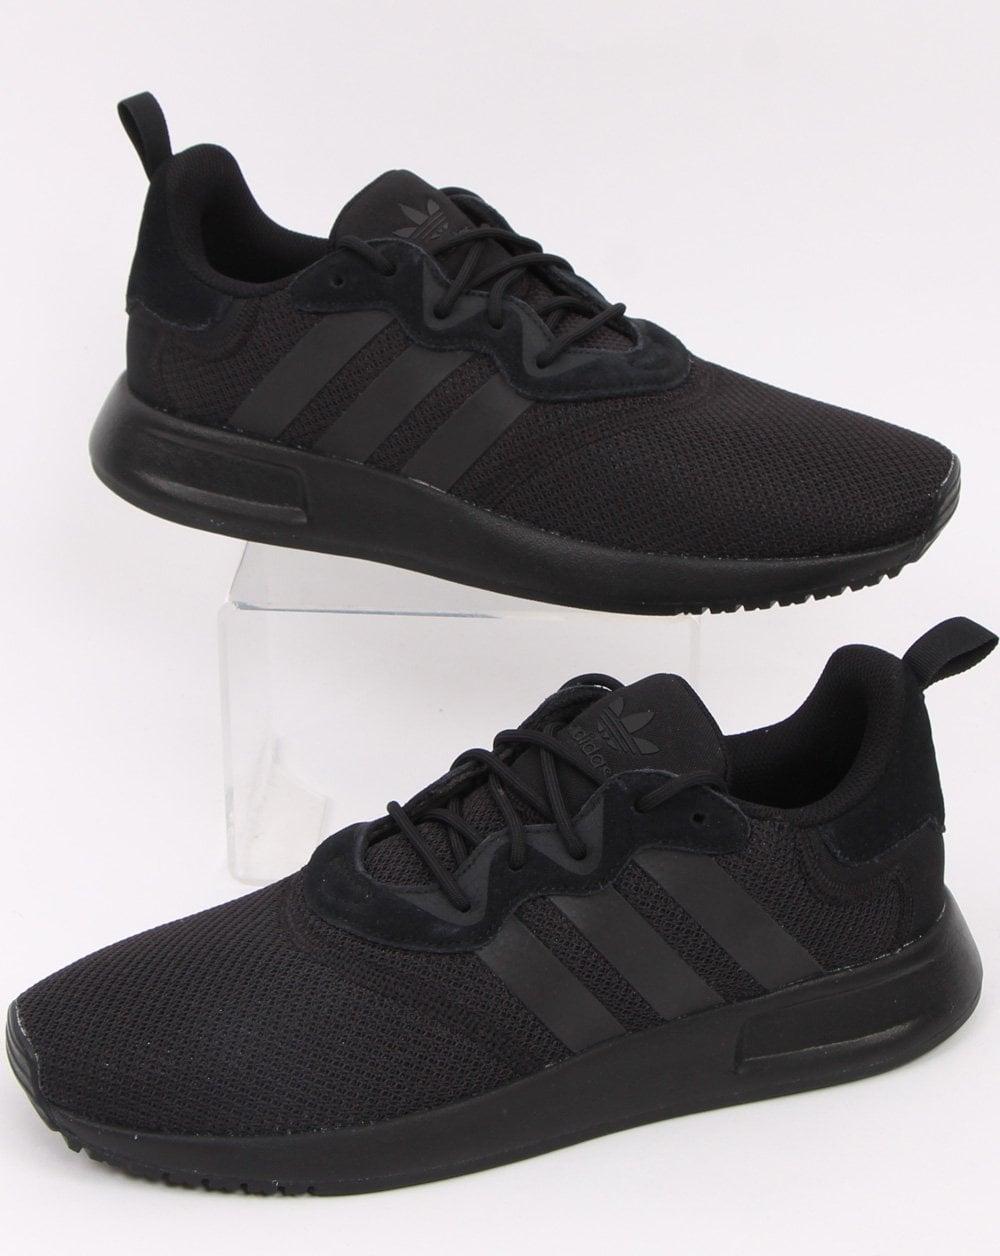 Adidas X_plr S Trainers Black